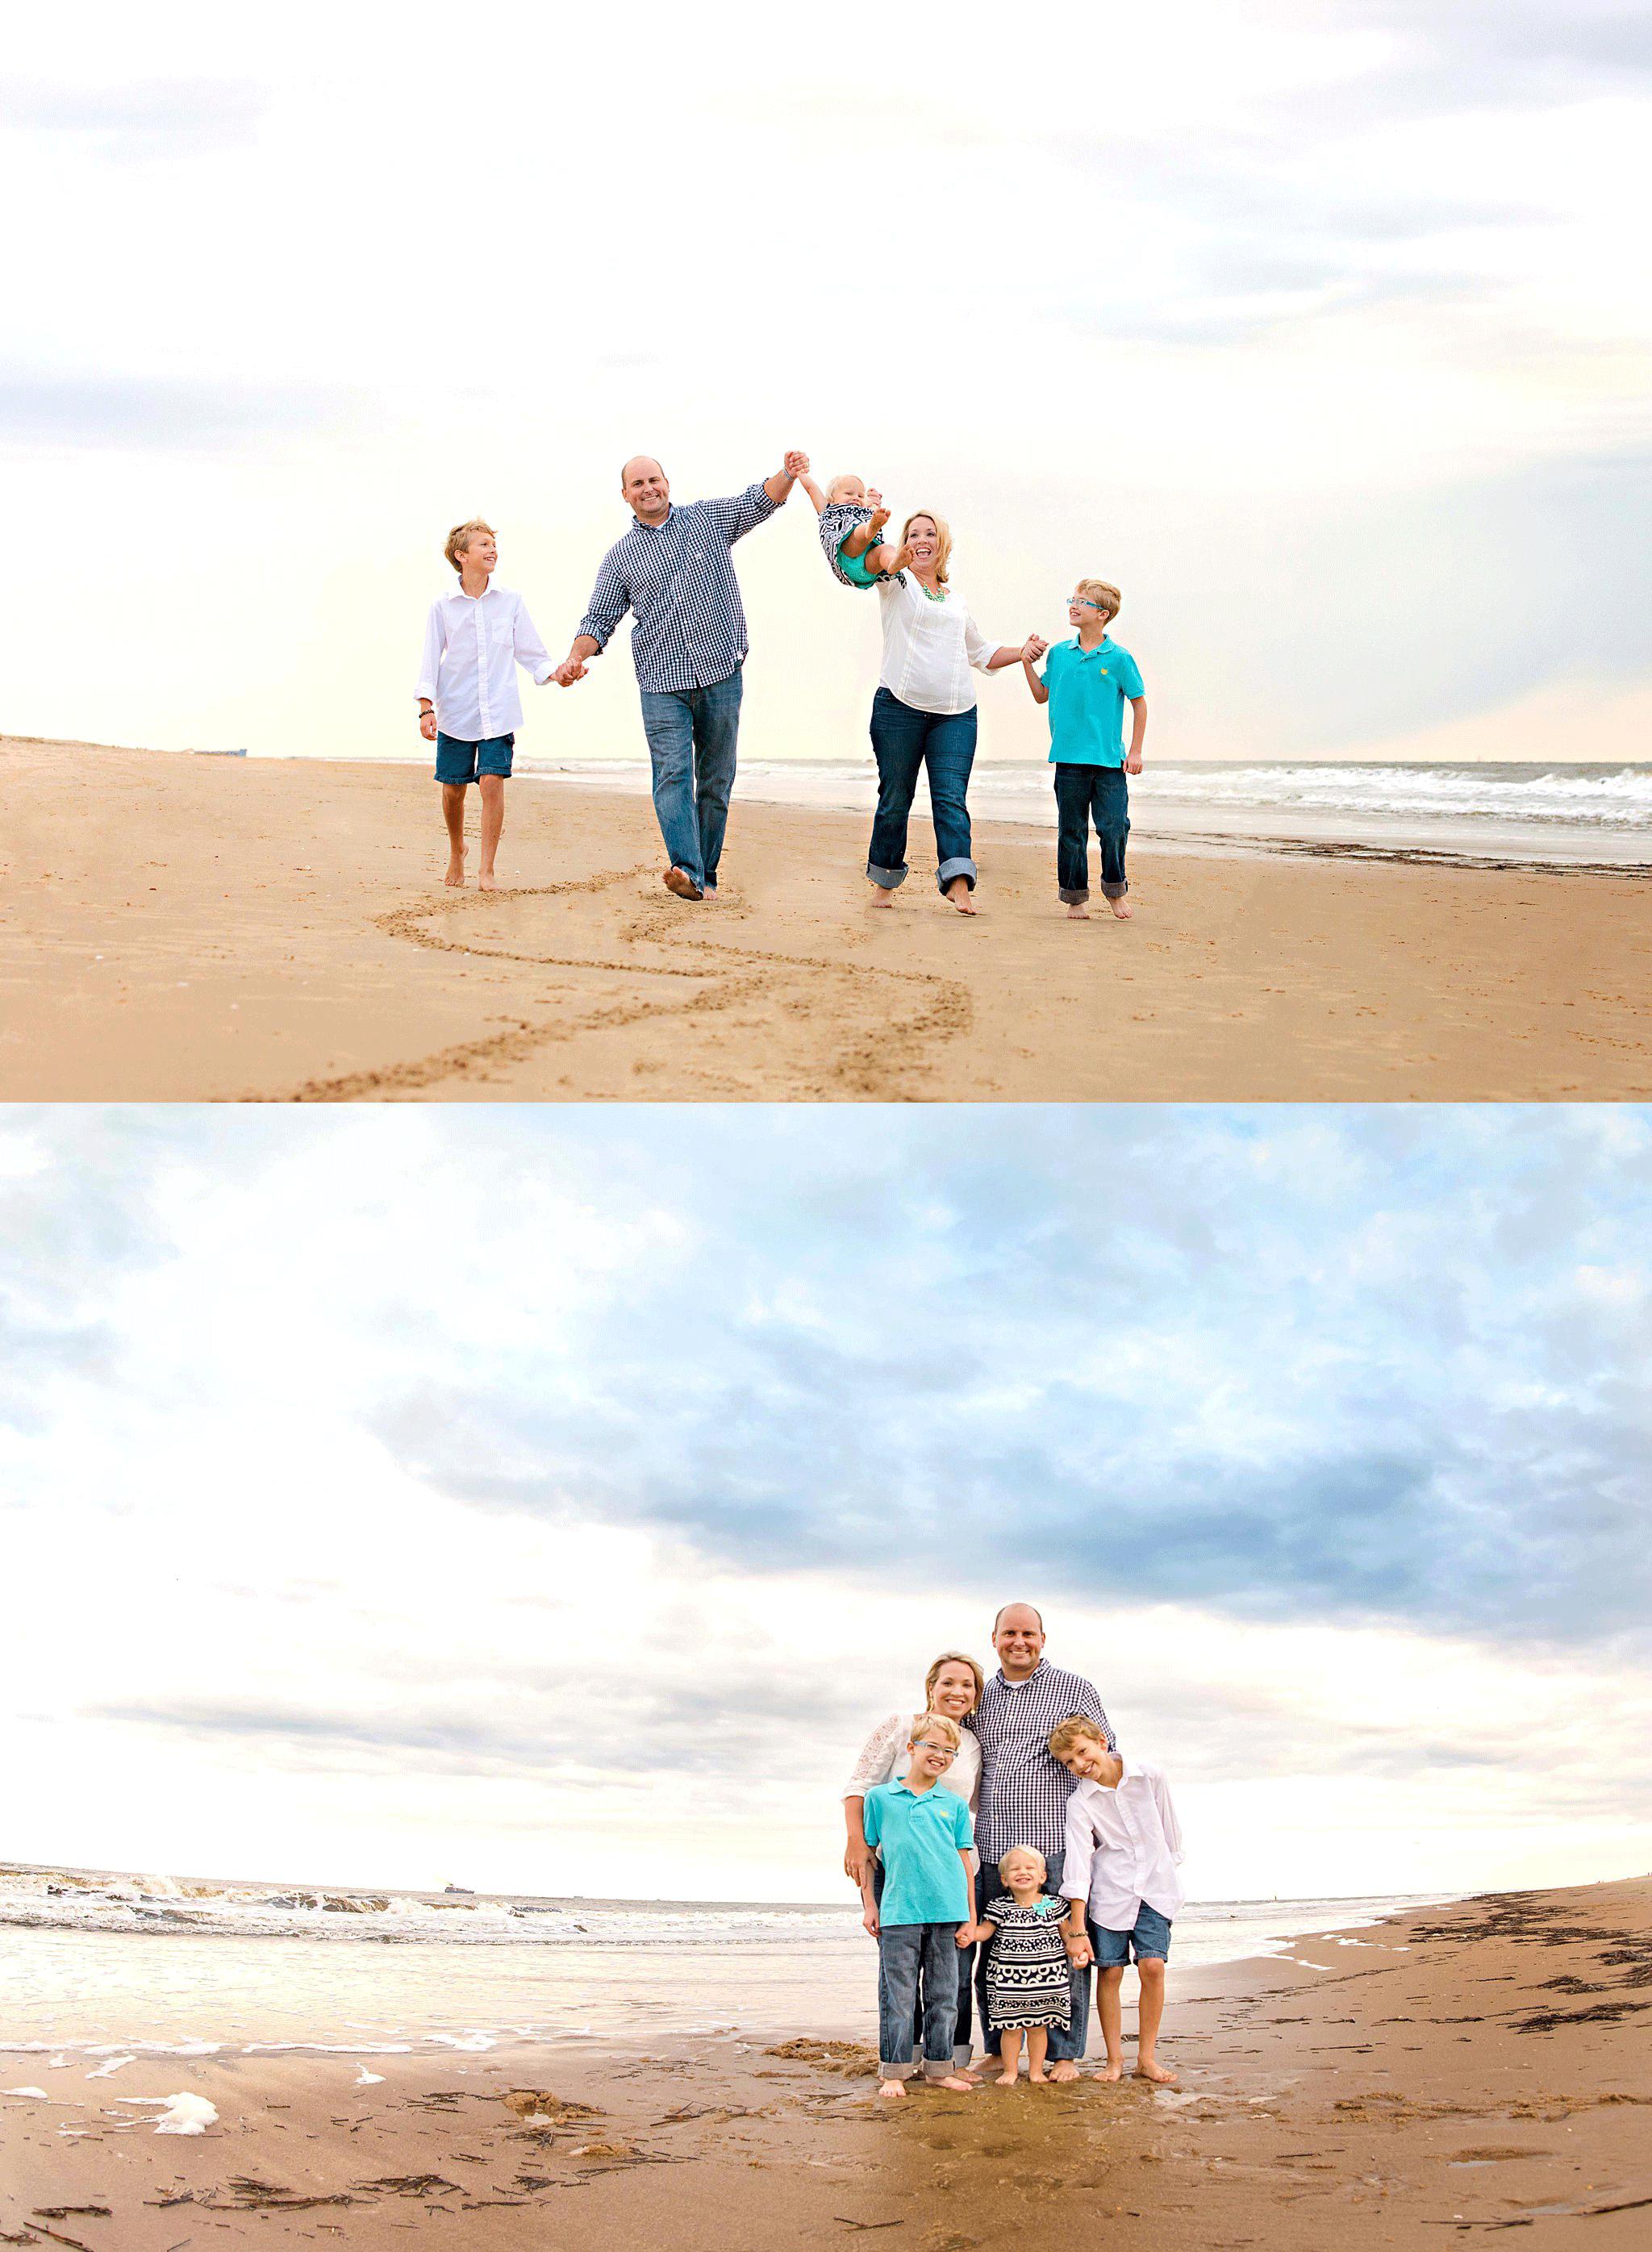 sandbridge-beach-photographers-family-photos-on-the-beach-virginia-beach-photographer-melissa-bliss-photography.png